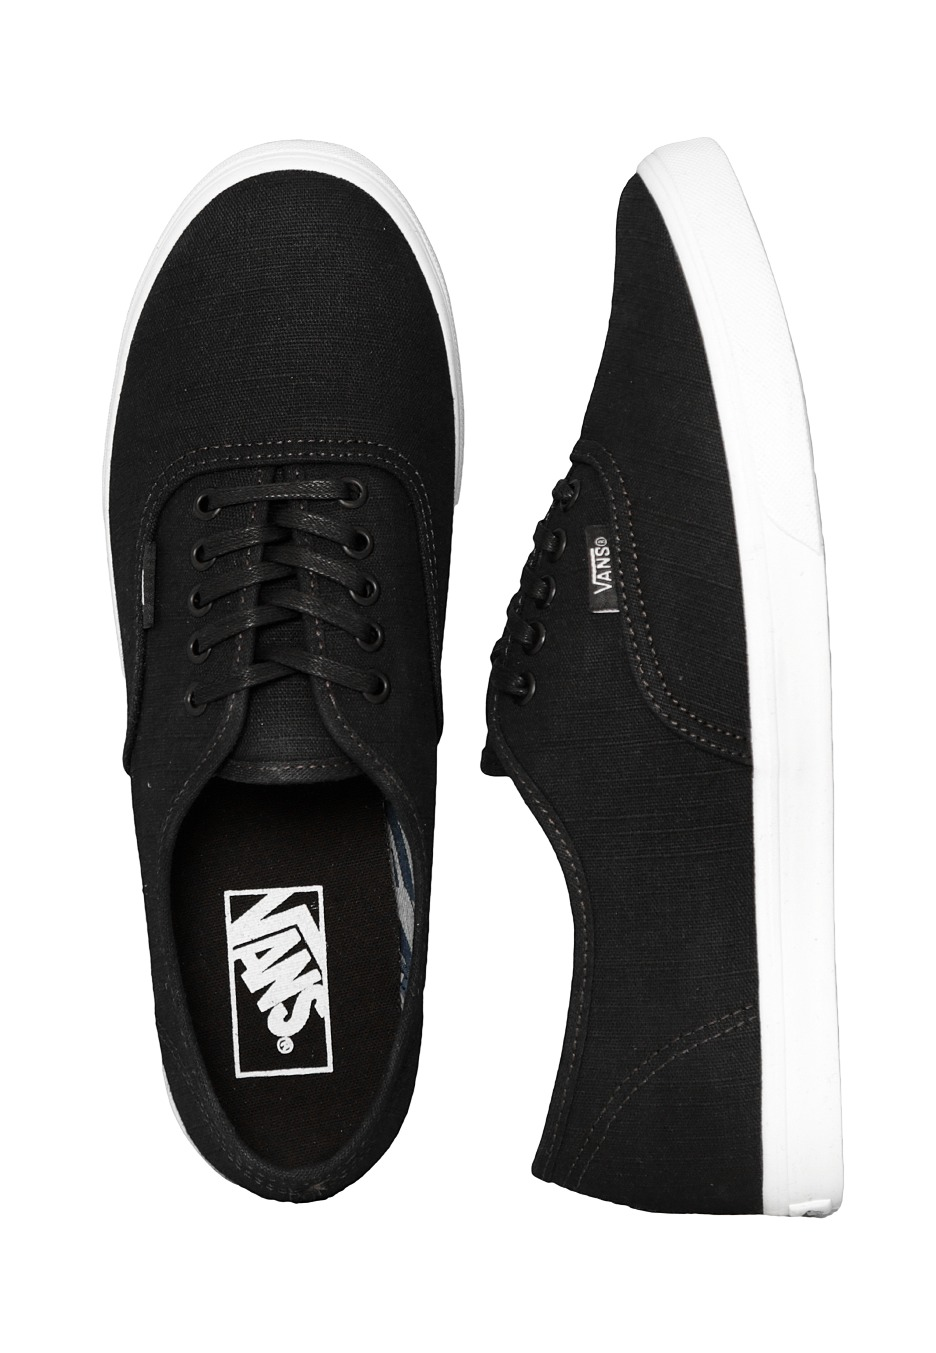 Vans - Authentic Lo Pro Indigo Tropical Black True White - Girl Shoes -  Impericon.com UK 3881e04dc